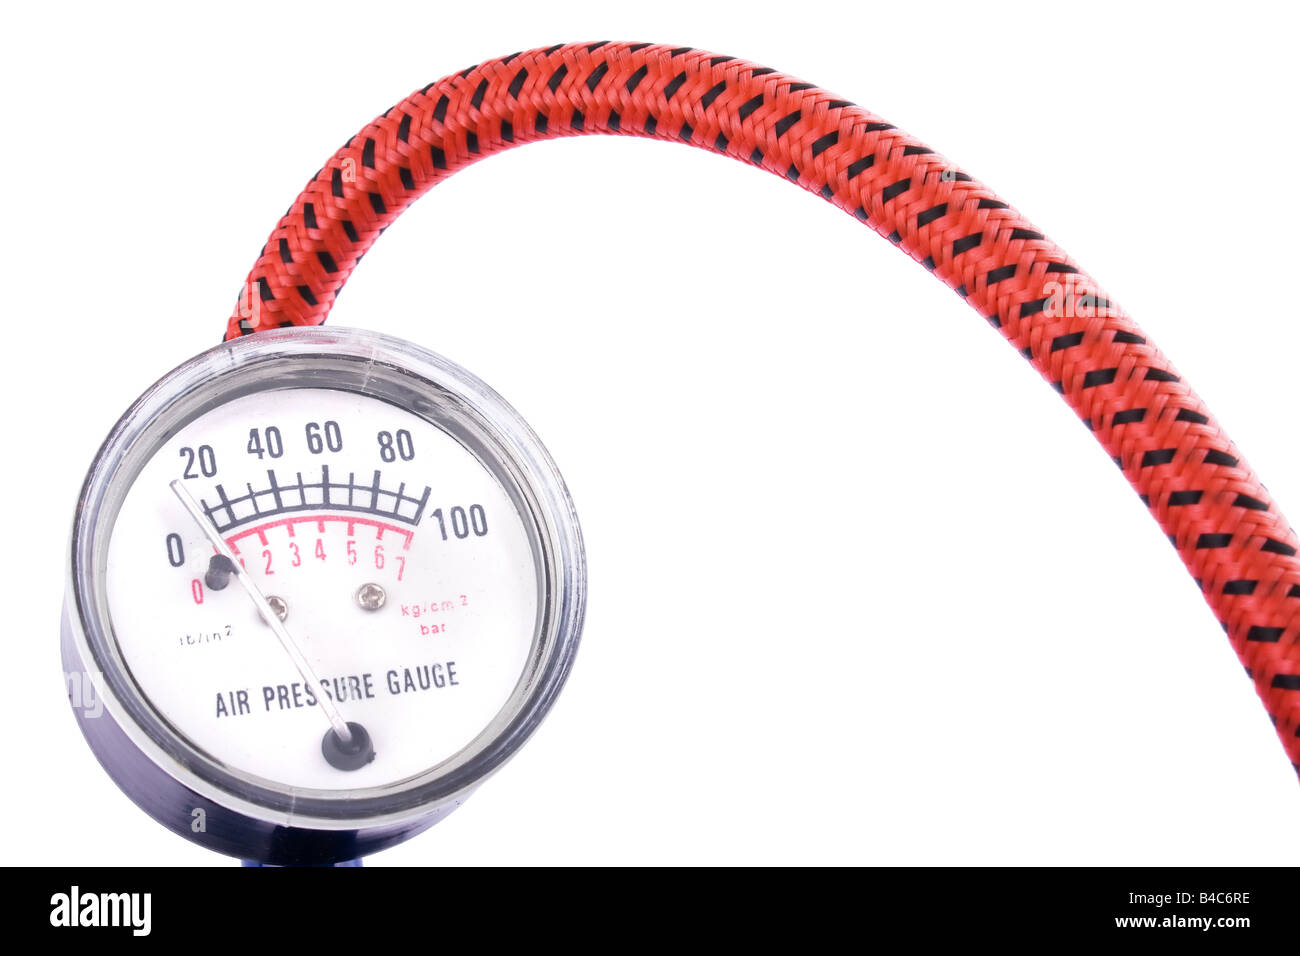 Air Pressure Gauge Stock Photos & Air Pressure Gauge Stock